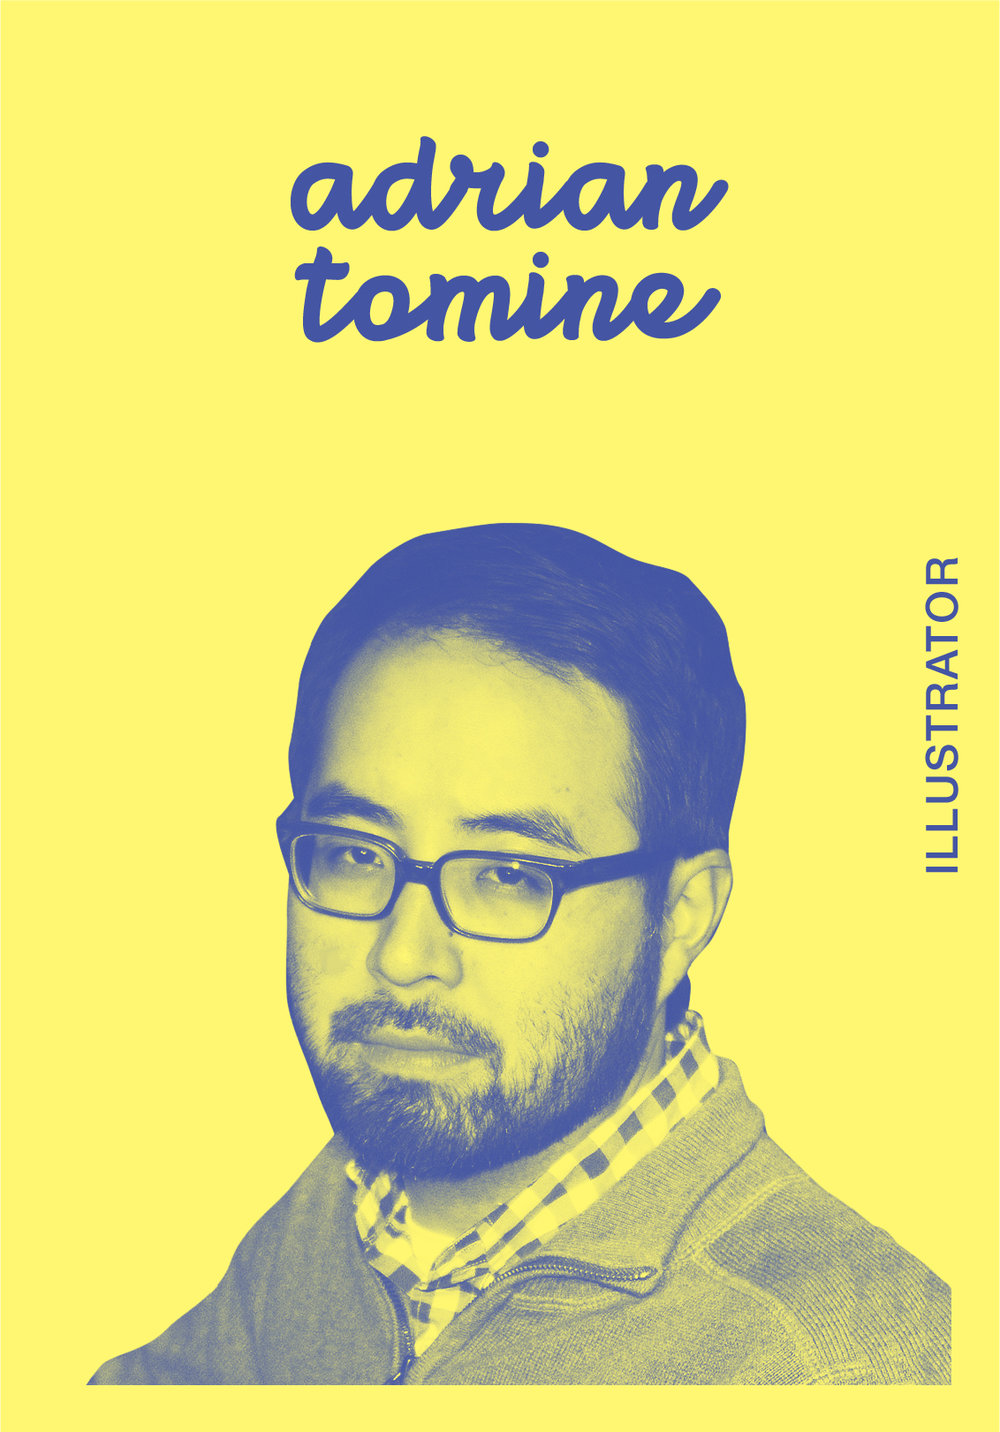 Adrian Tomine   WEBSITE   IG: ADRIANTOMINE